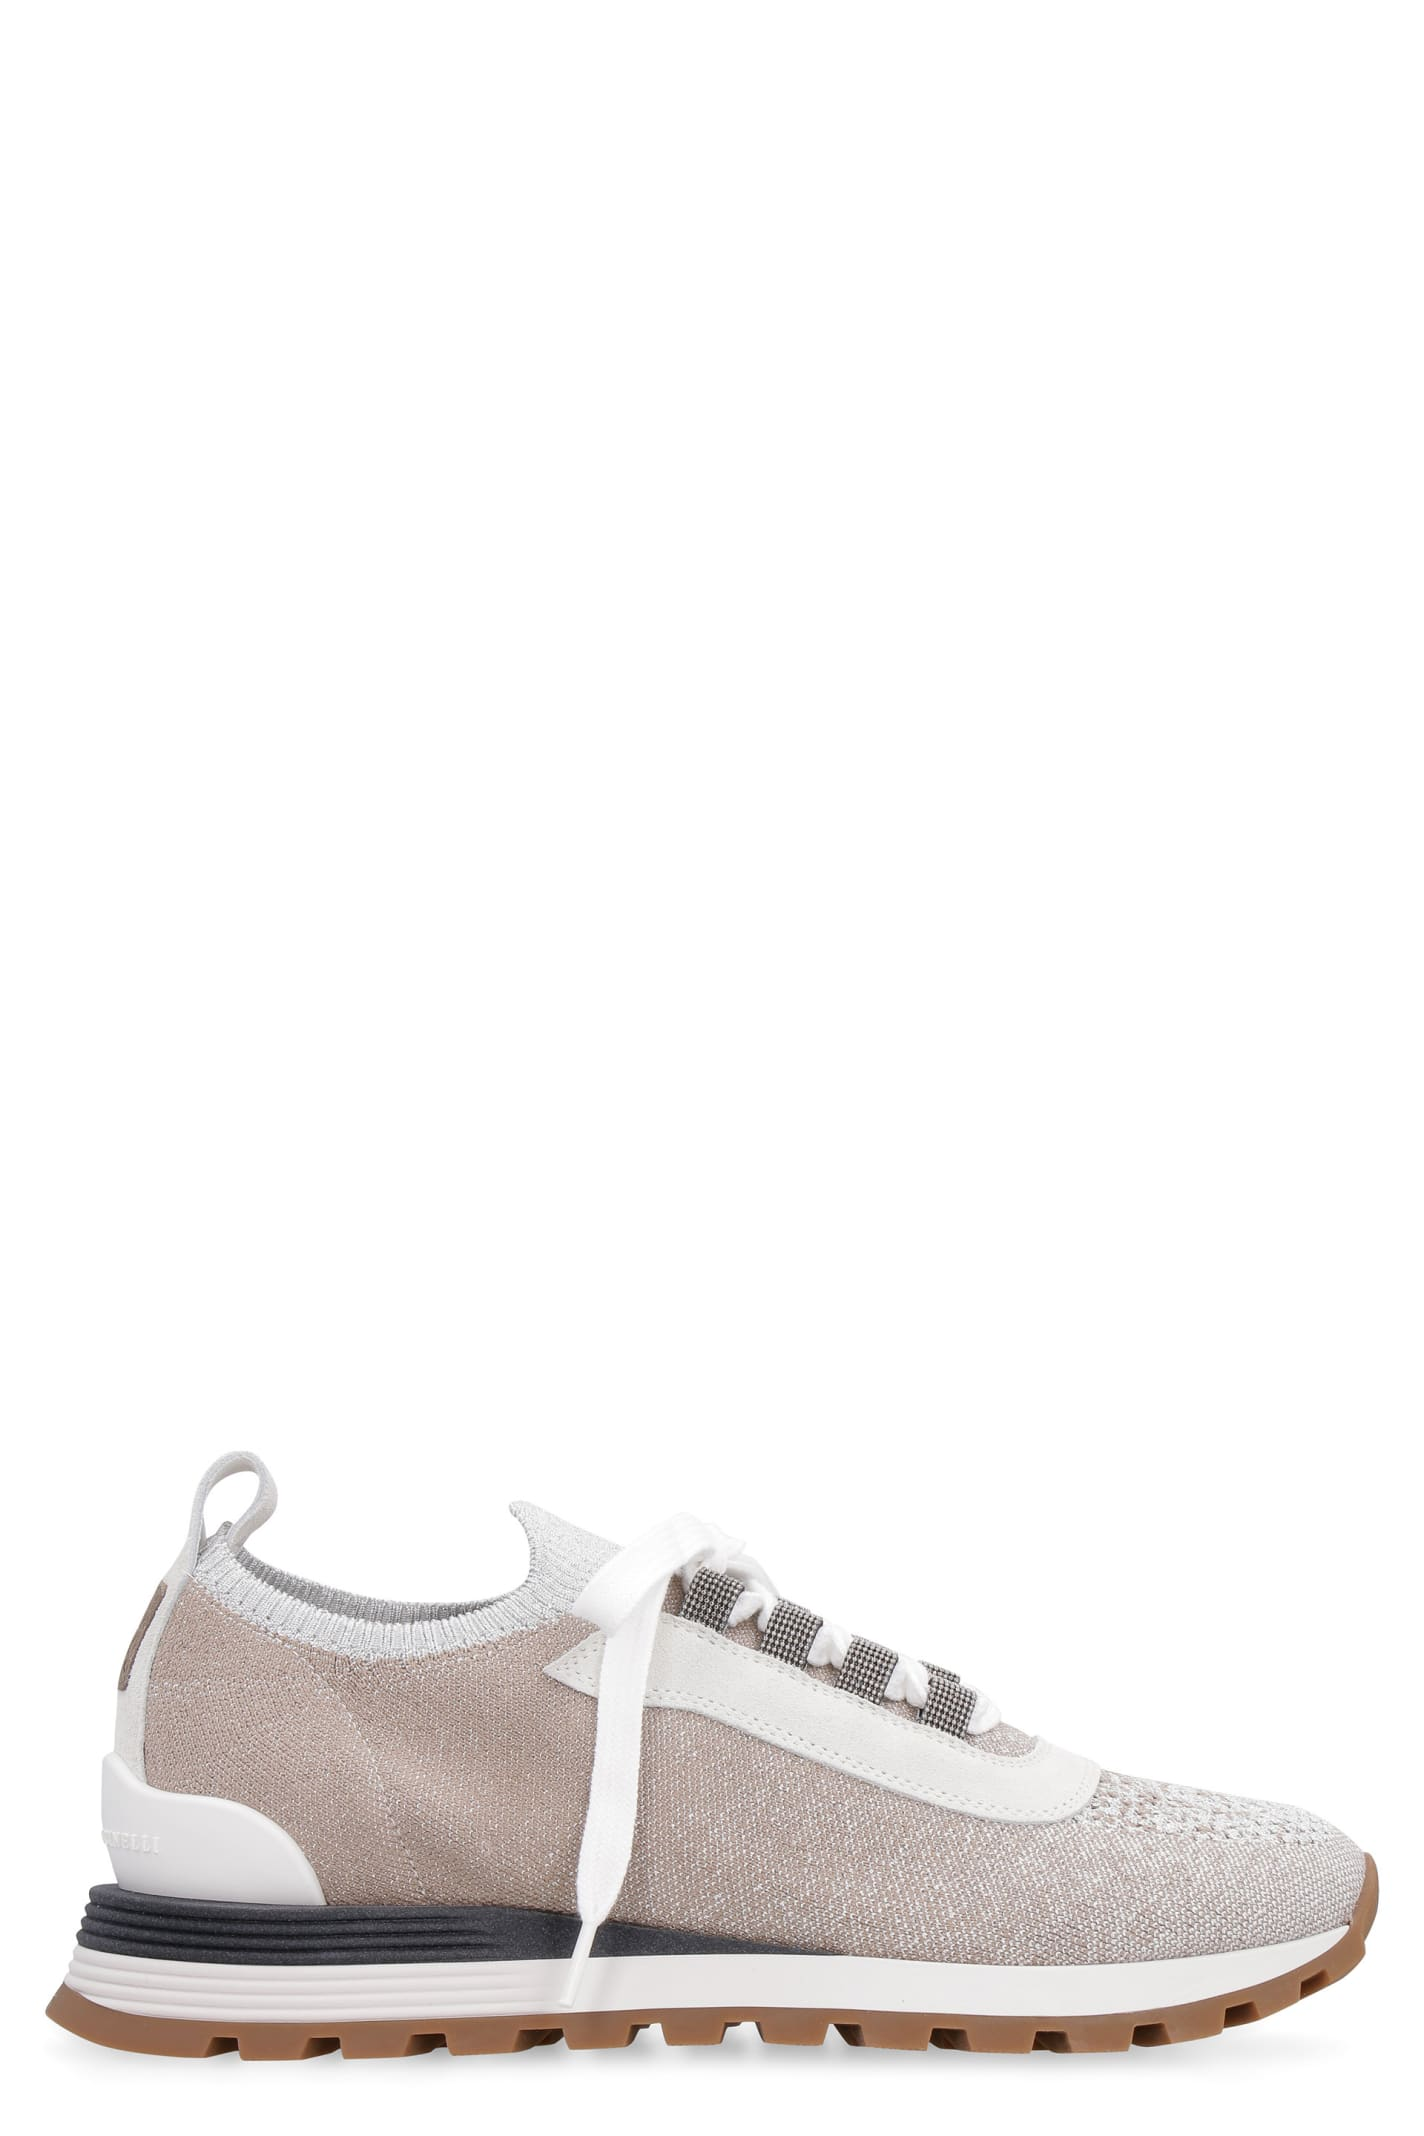 Knit Low-top Sneakers